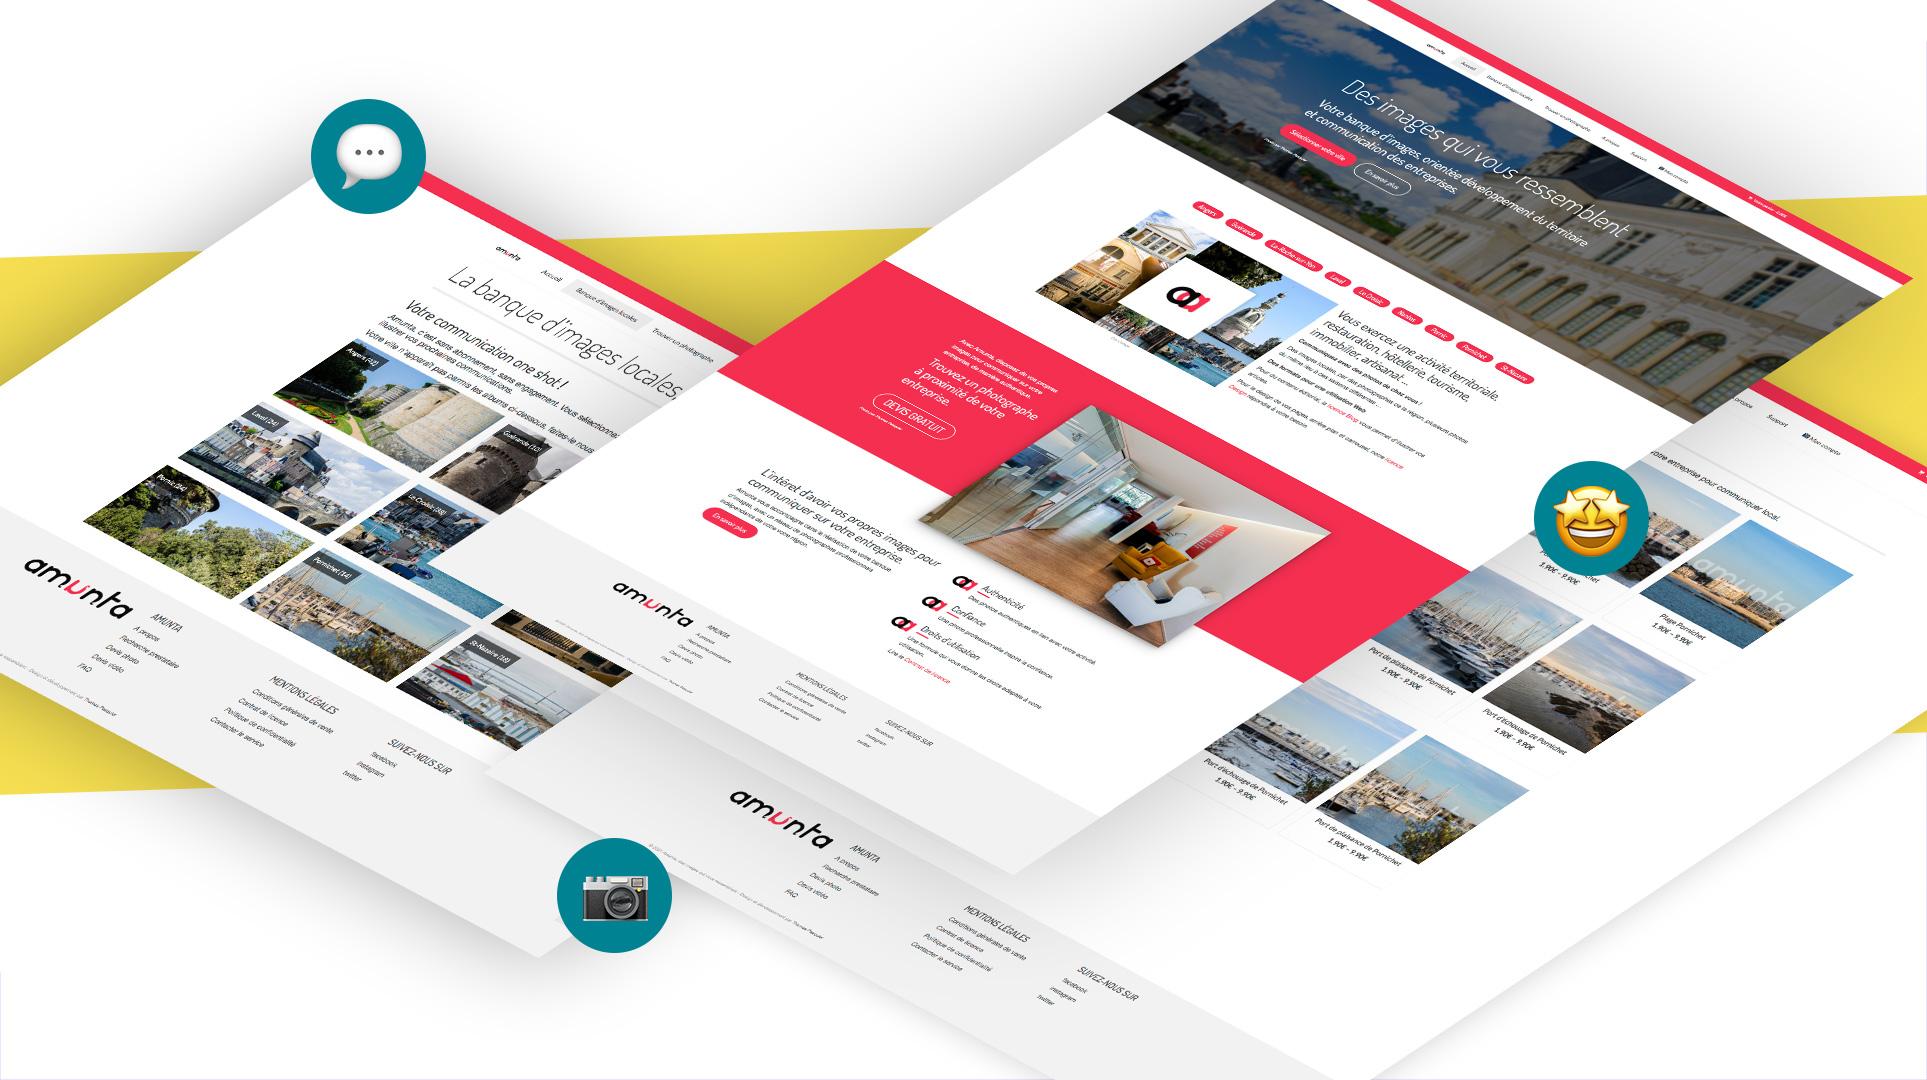 mockup design site e-commerce banque d'images Amunta